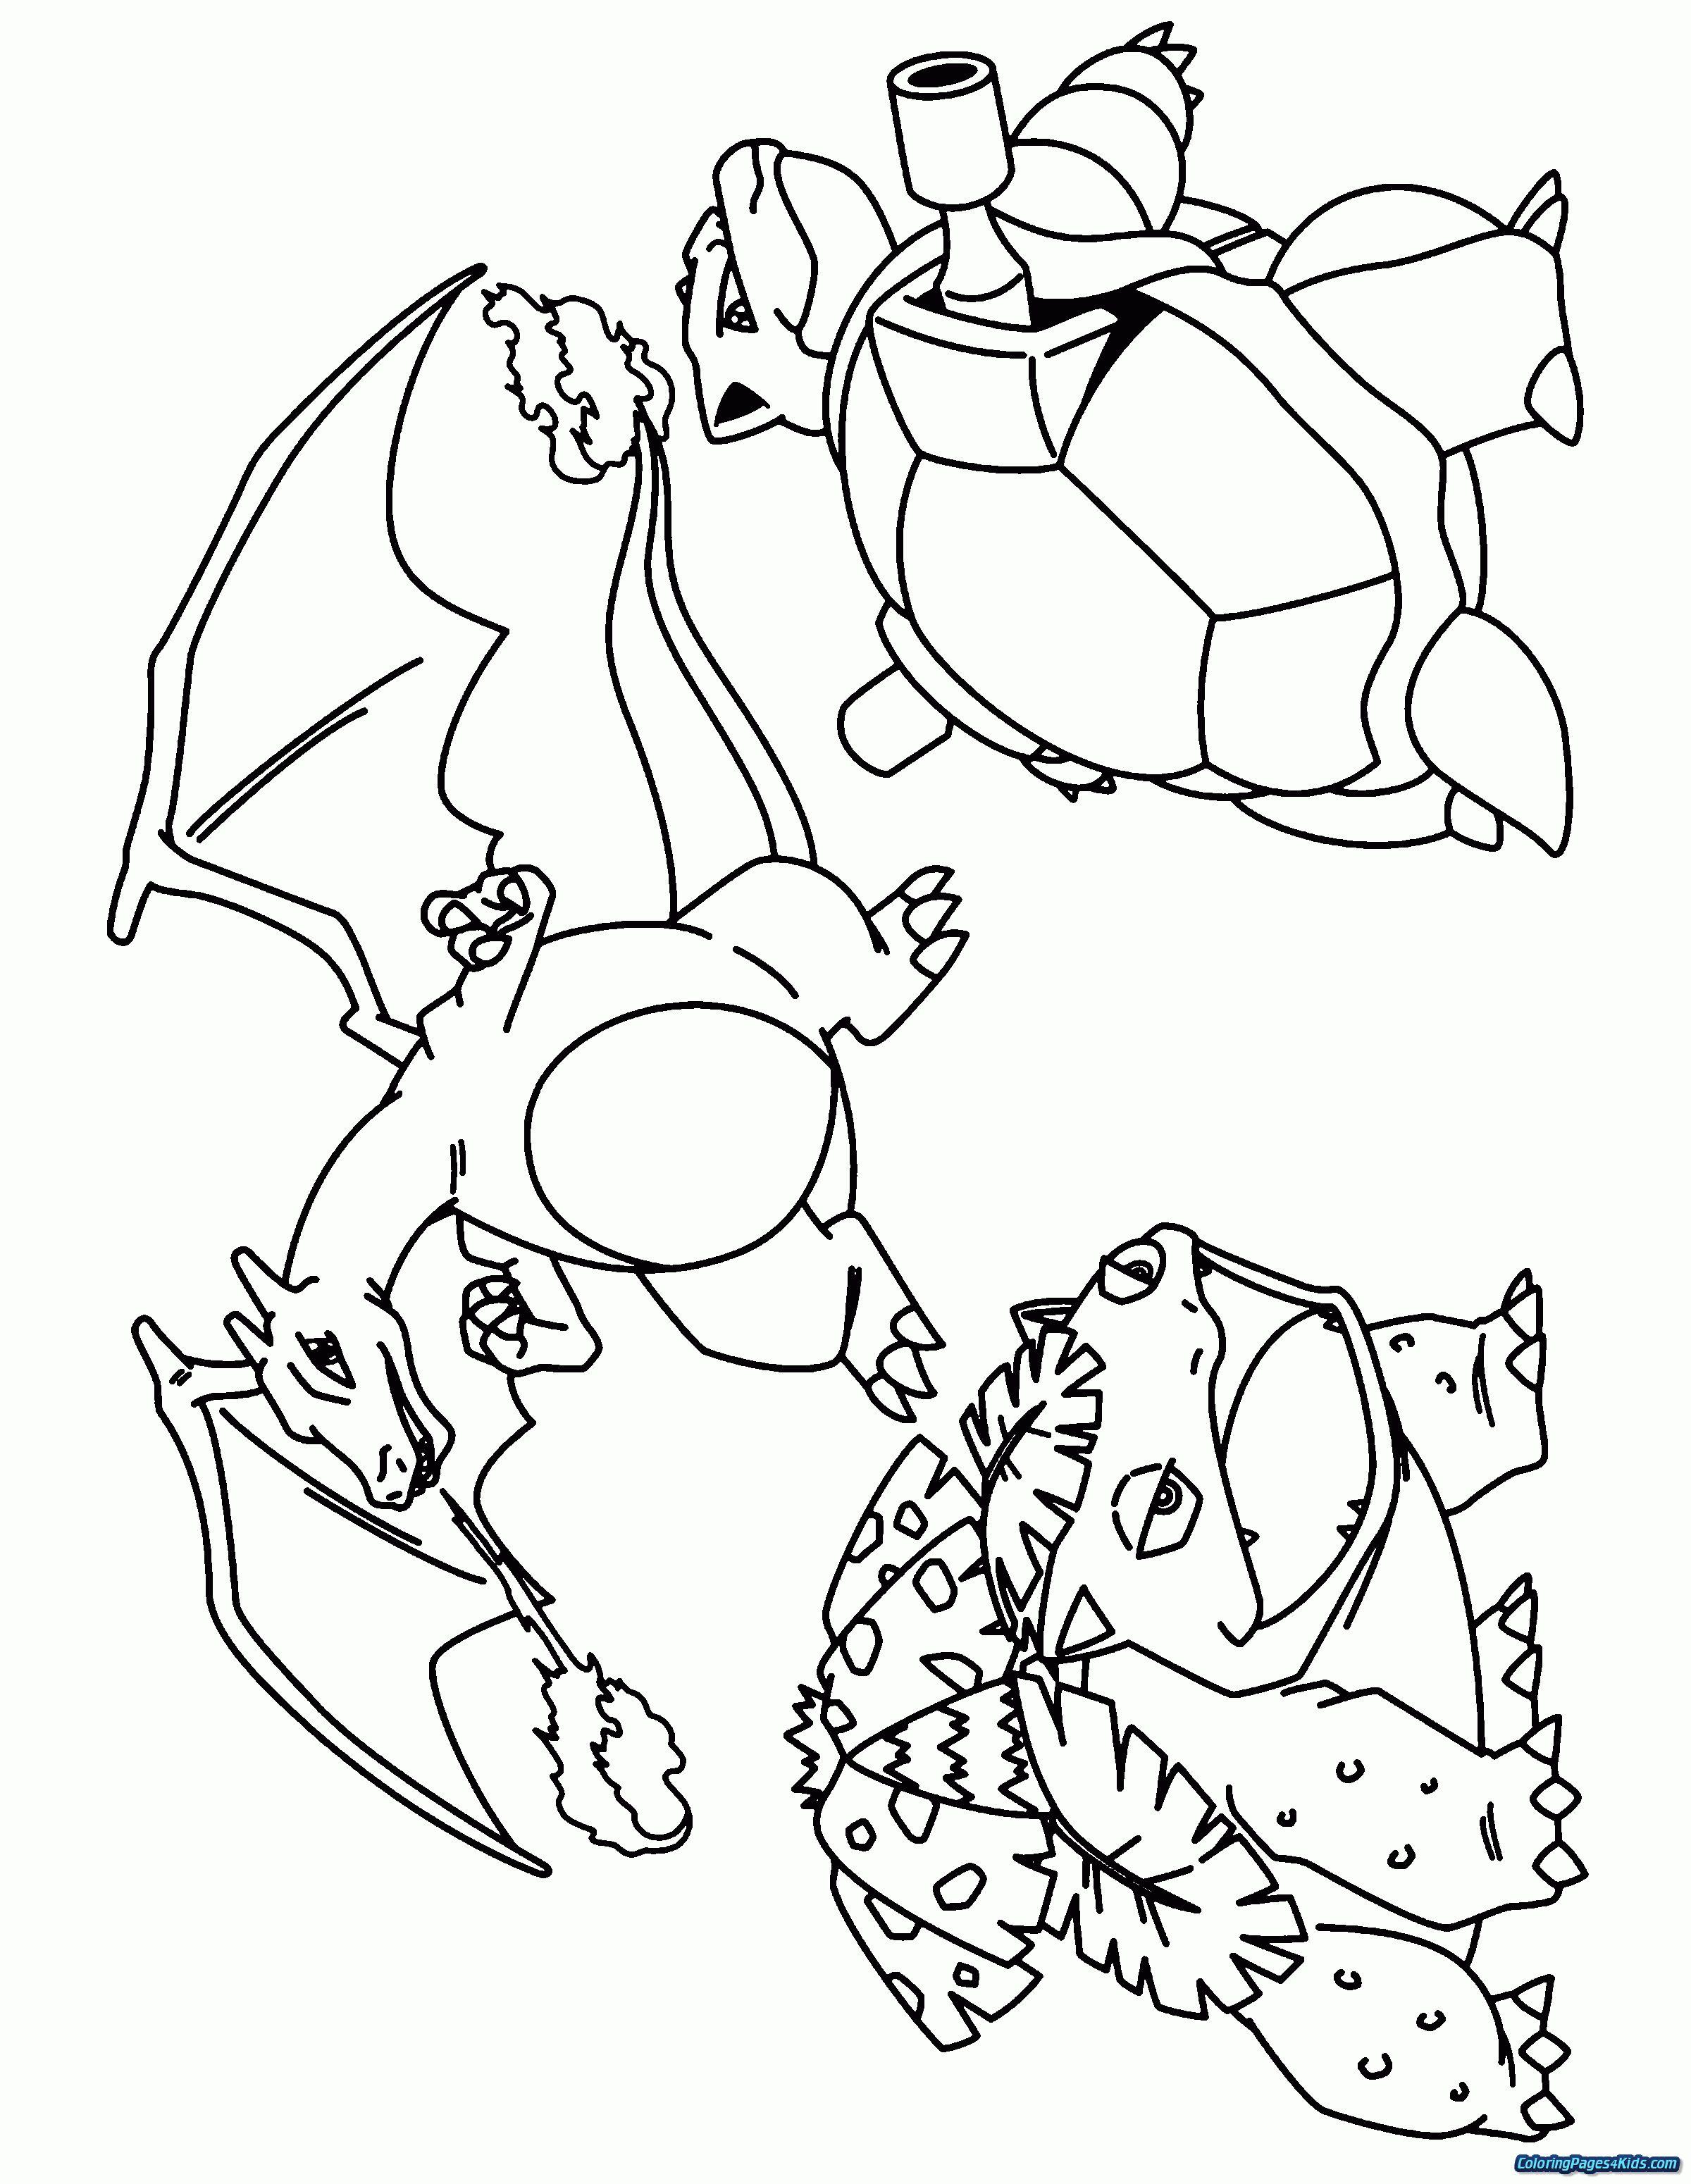 pokemon coloring pages mega charizard  キャラクター 塗り絵 ポケモンの